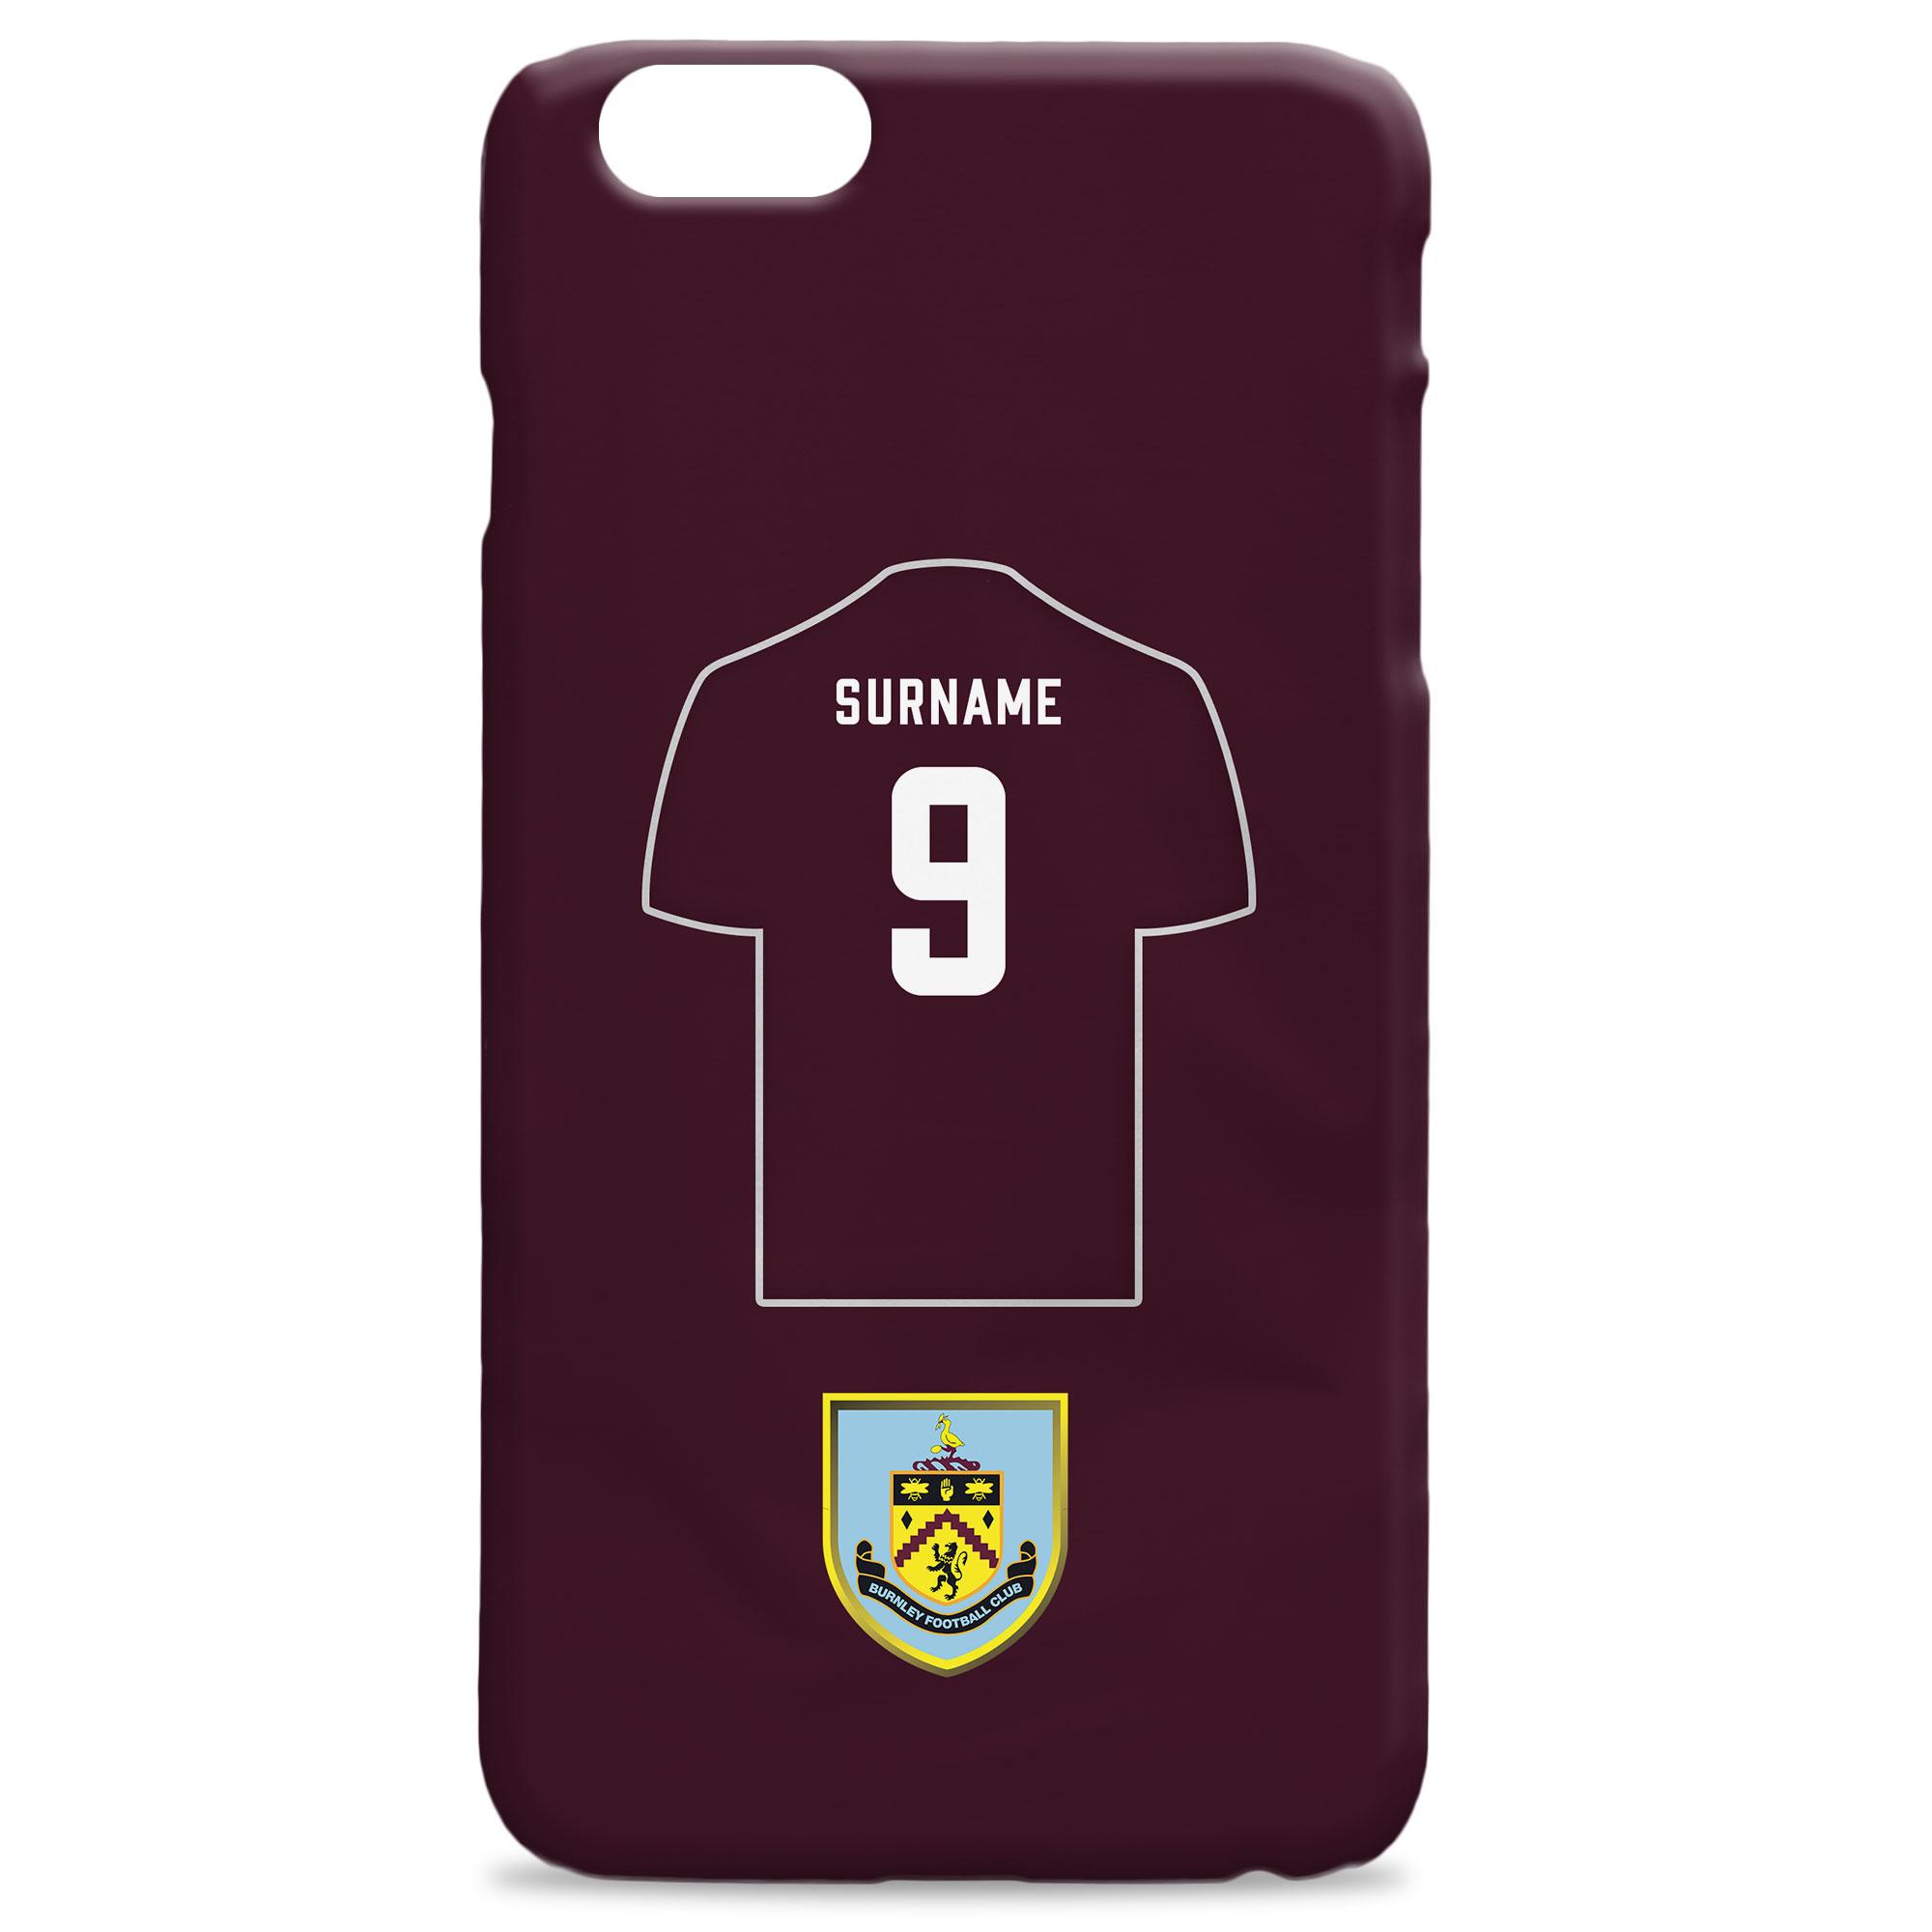 Burnley FC Shirt Hard Back Phone Case